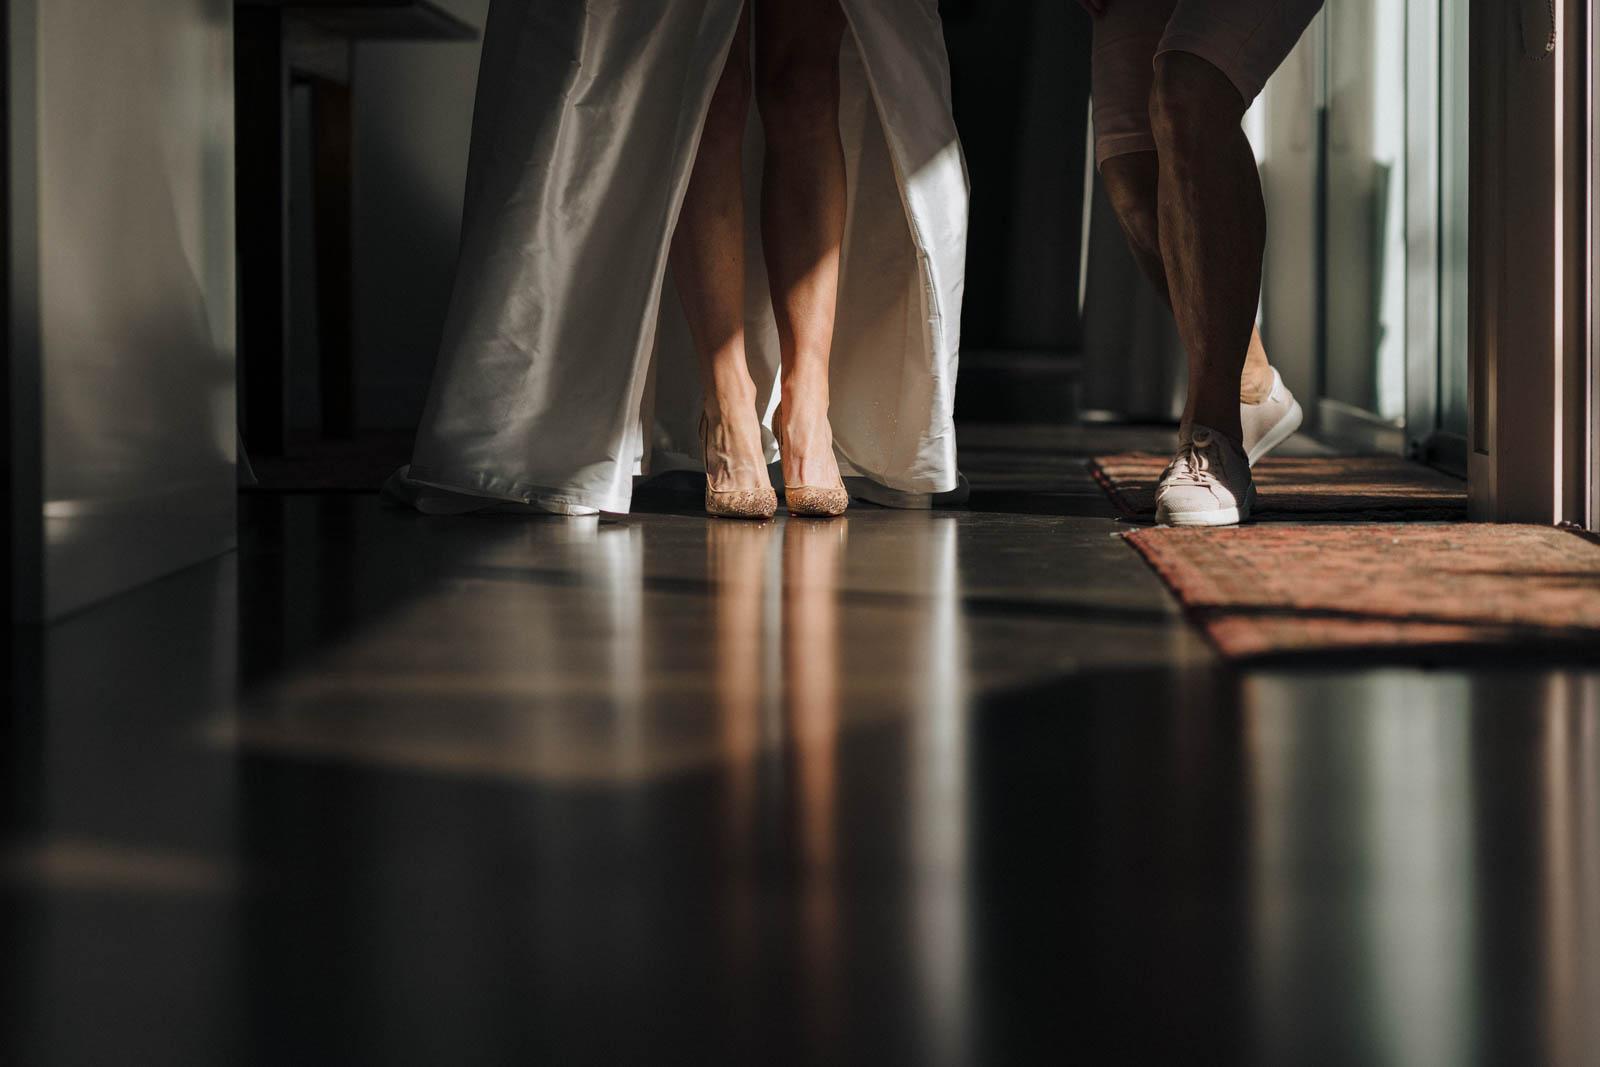 newfound-s-p-mt-maunganui-tauranga-wedding-photographer-1407-A9_04416